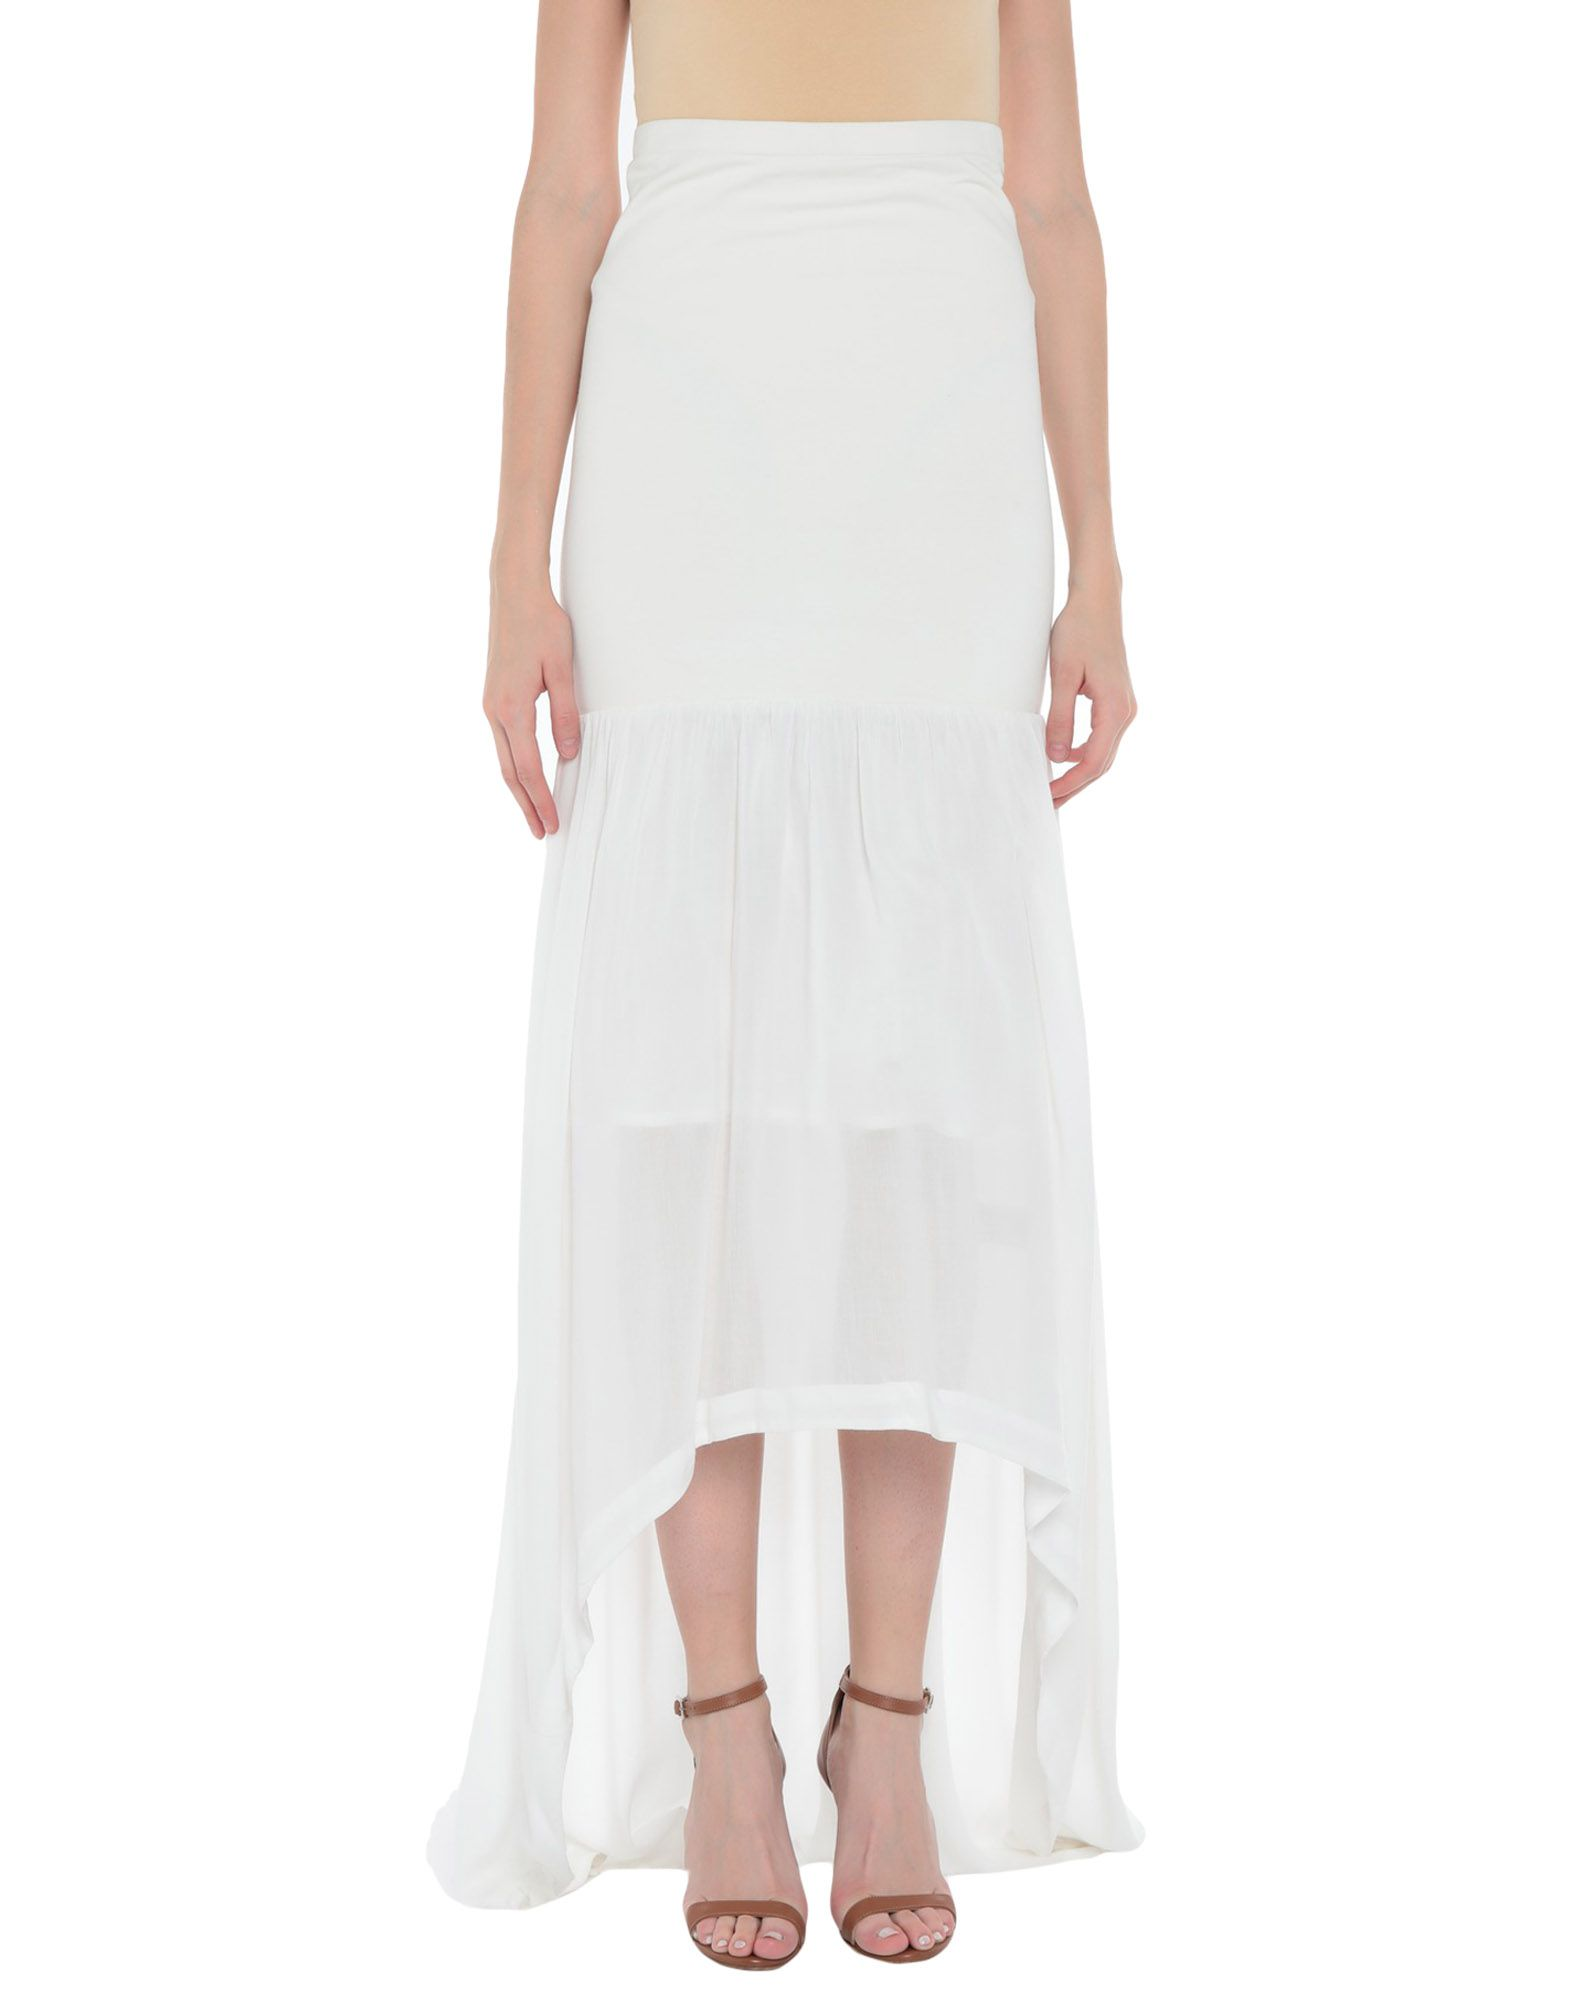 купить LOIZA by PATRIZIA PEPE Длинная юбка по цене 2750 рублей